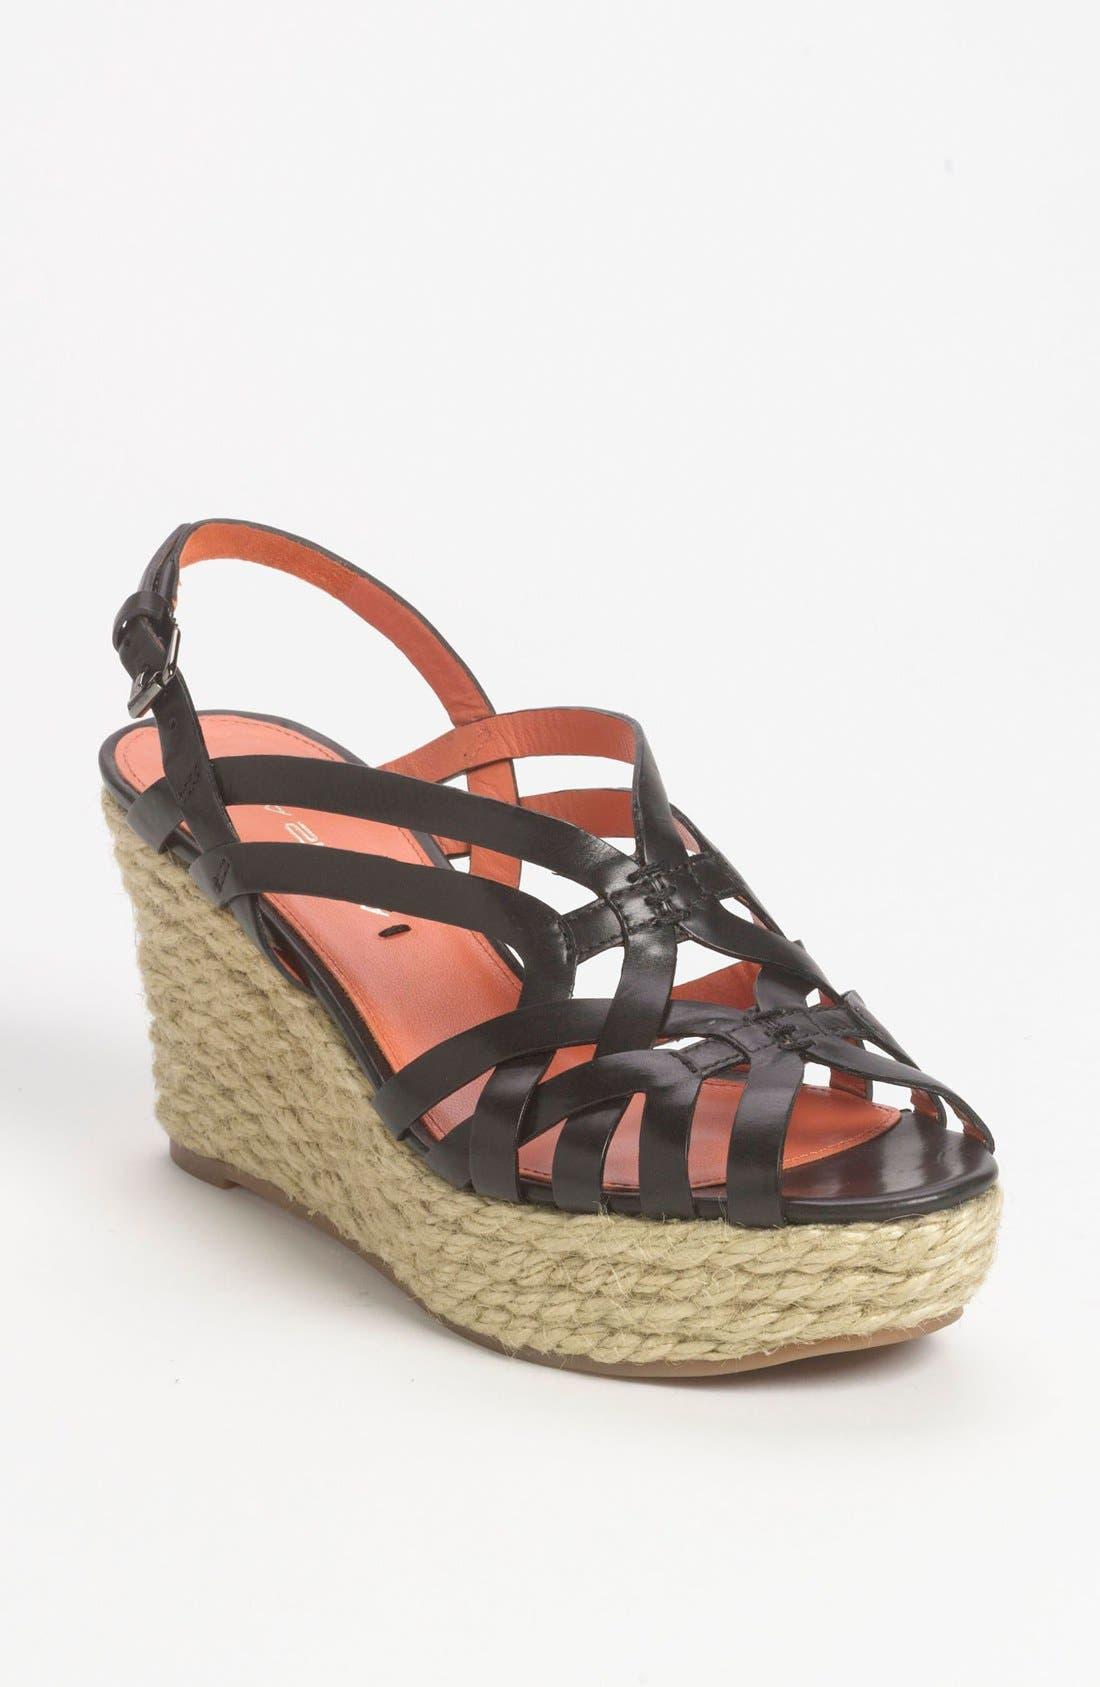 Alternate Image 1 Selected - Via Spiga 'Mabel' Wedge Sandal (Special Purchase)